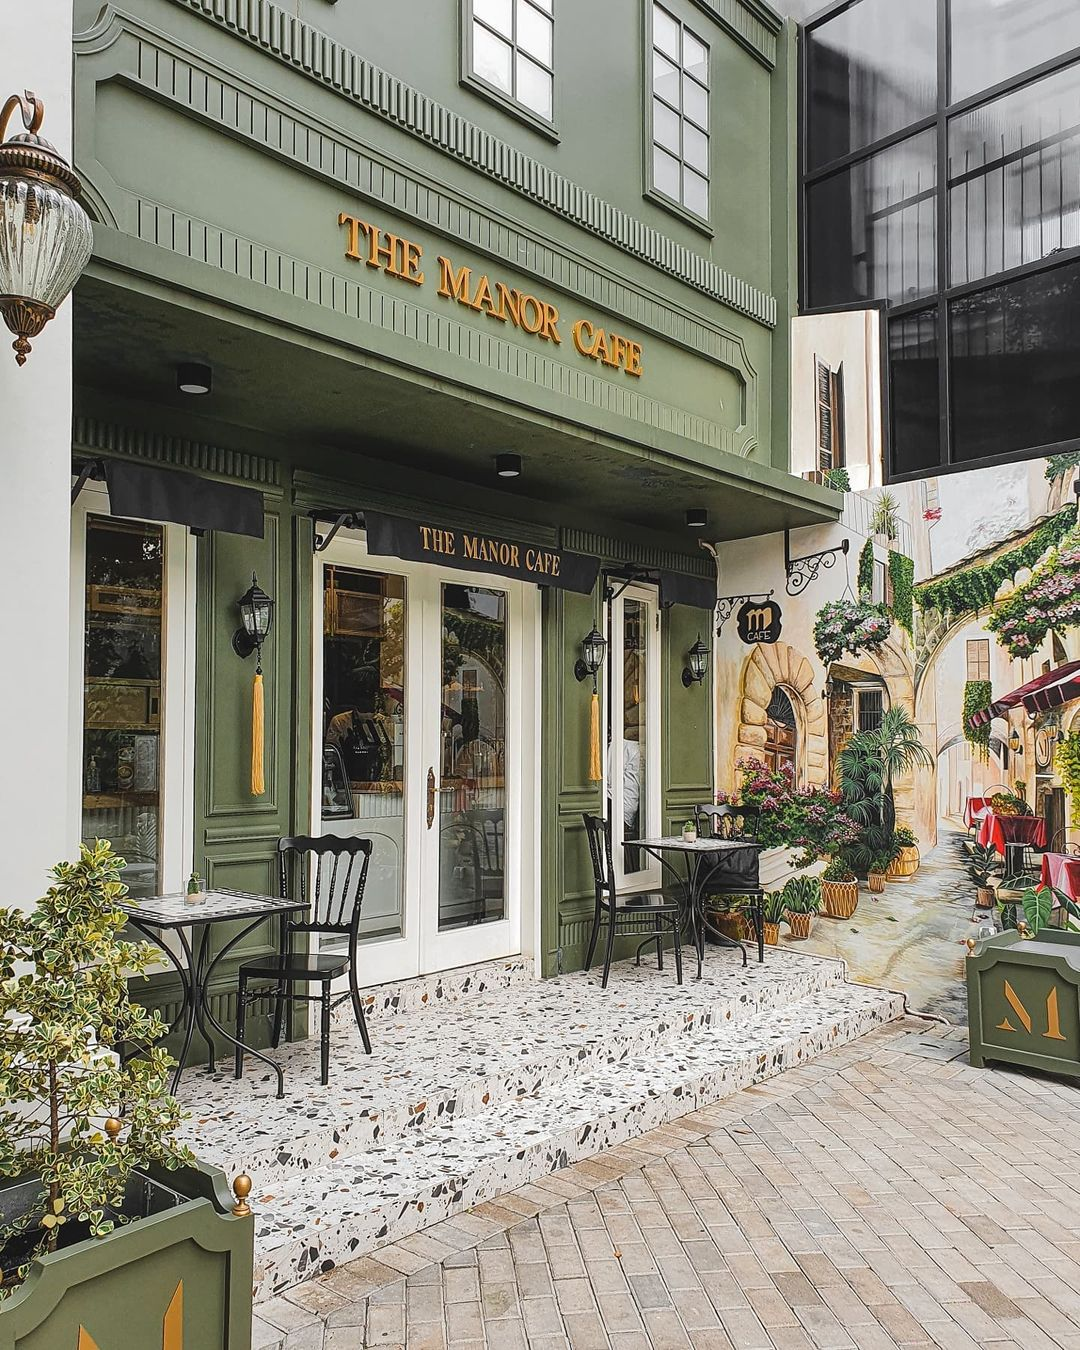 Lokasi The Manor Cafe Depok Image From @saepulhdyt